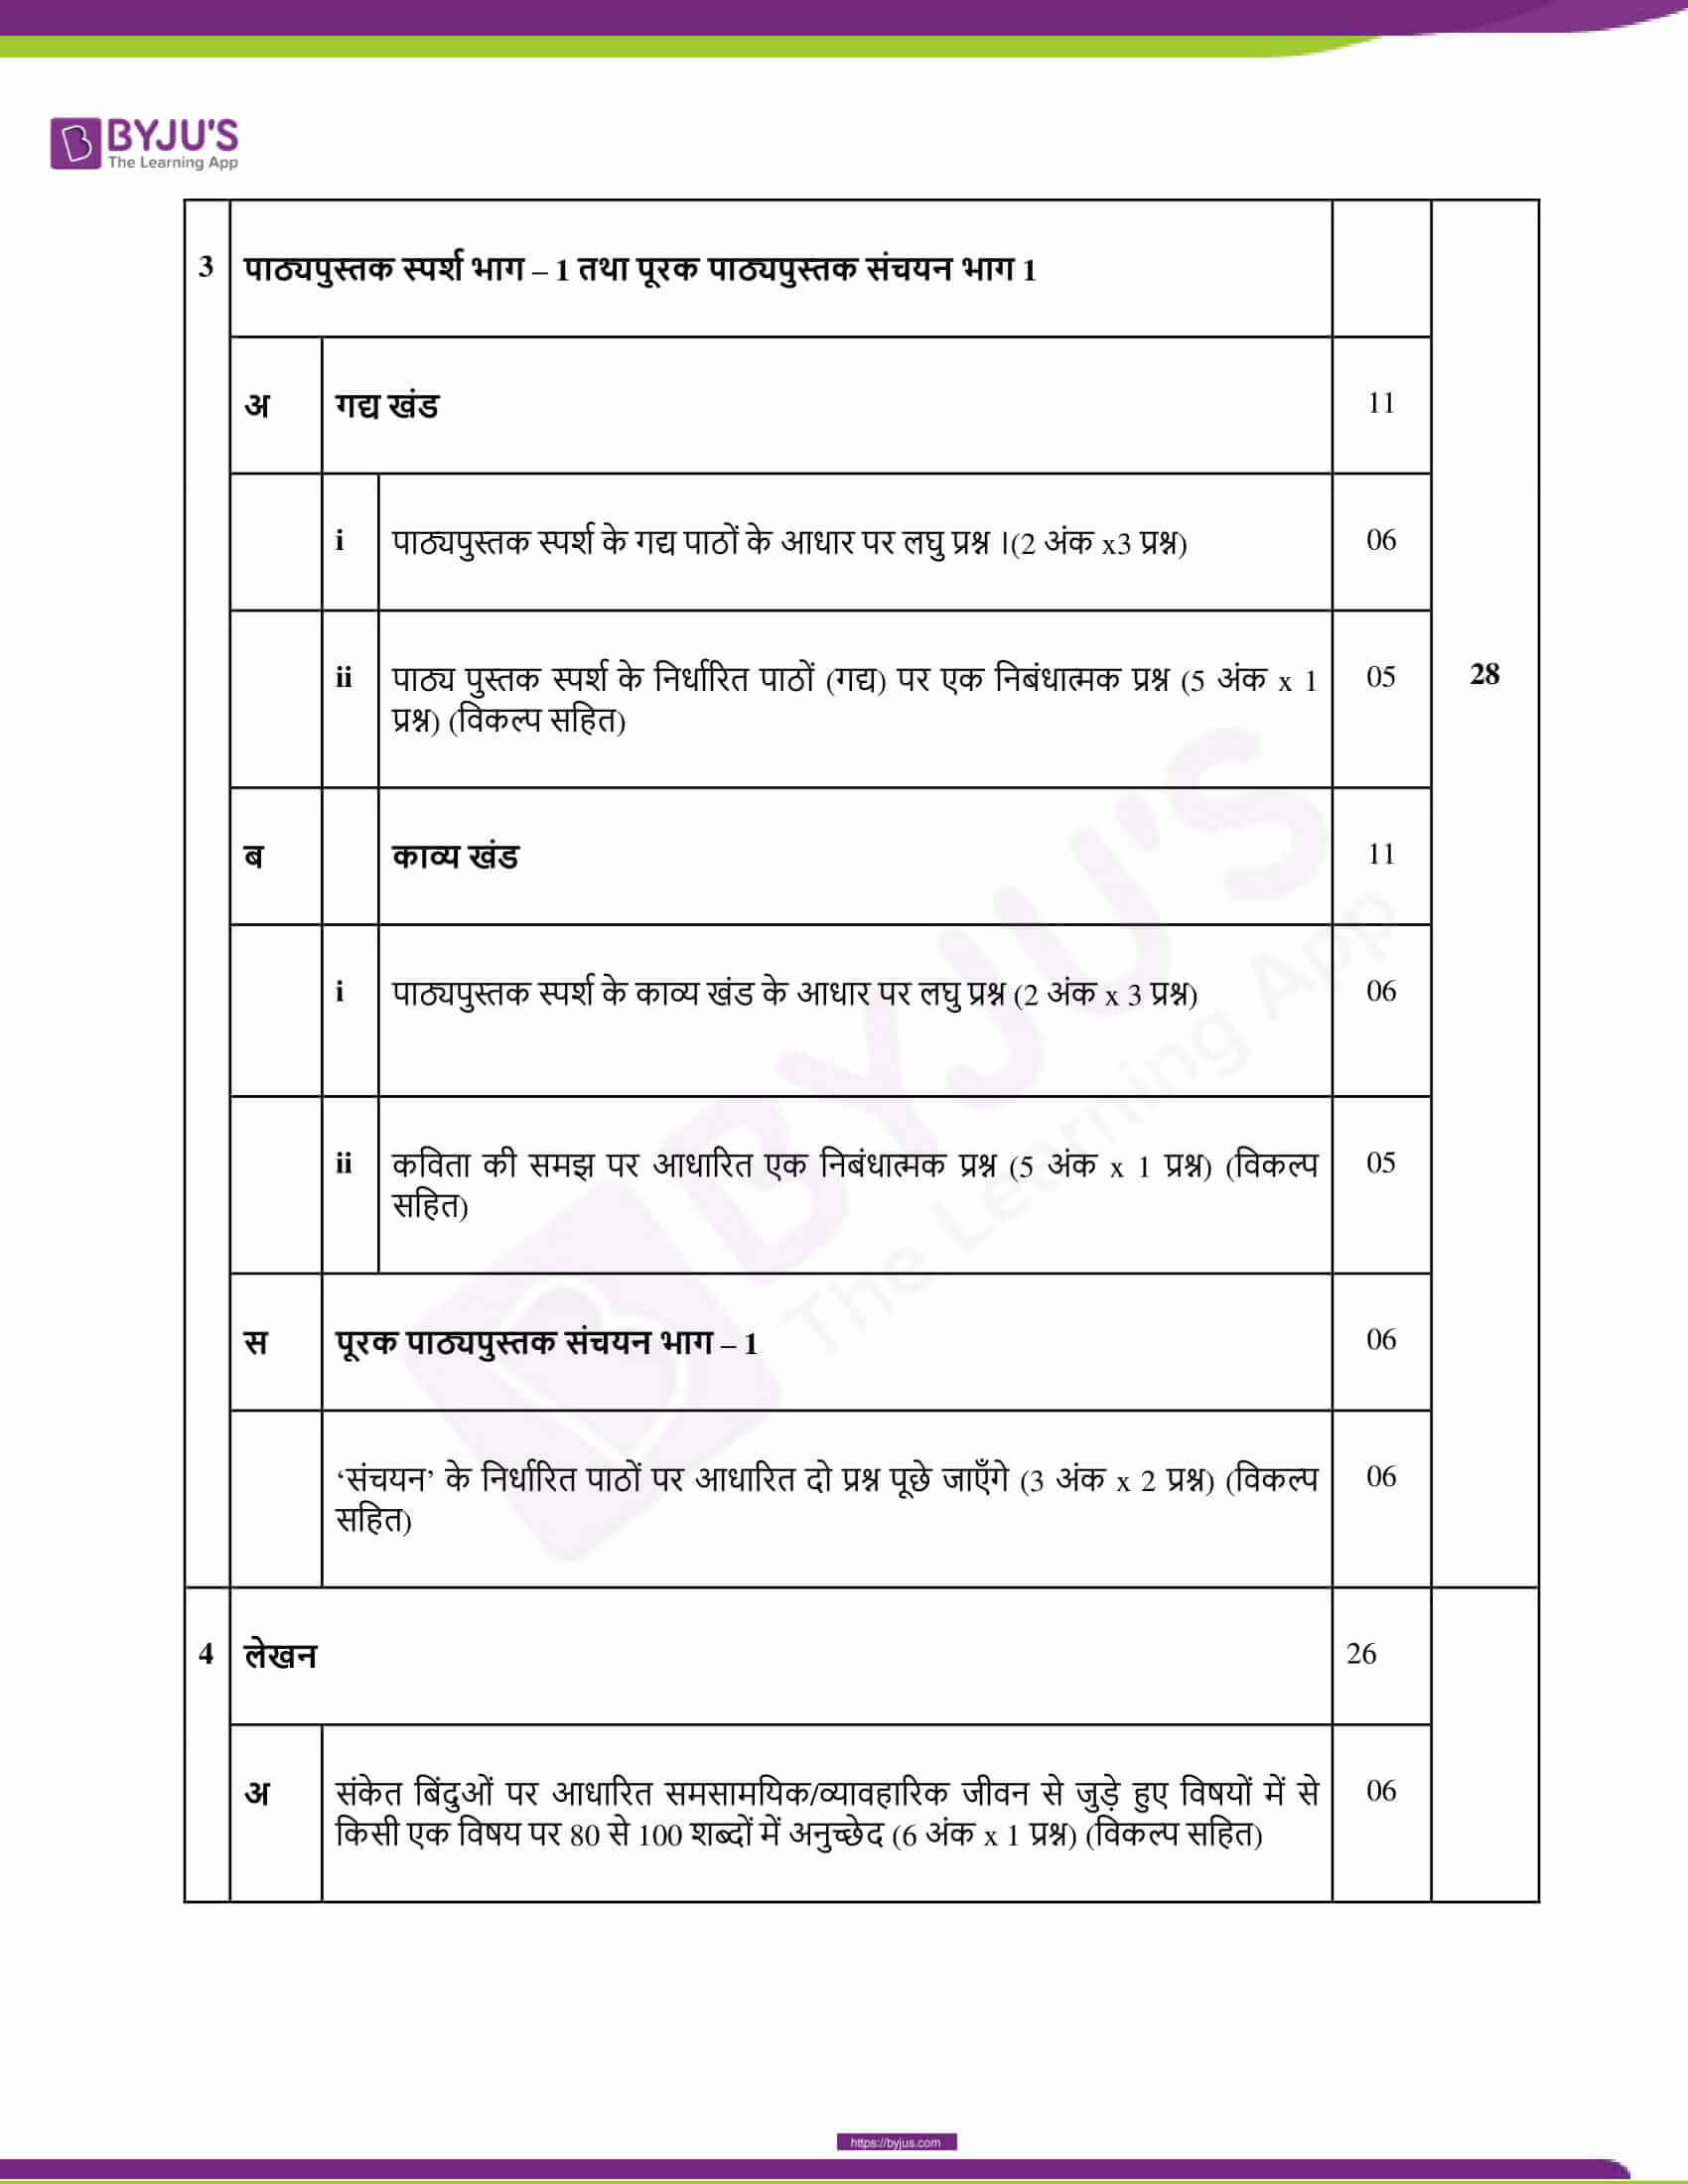 CBSE Class 10 Hindi Course B Revised Syllabus 2020 21 09